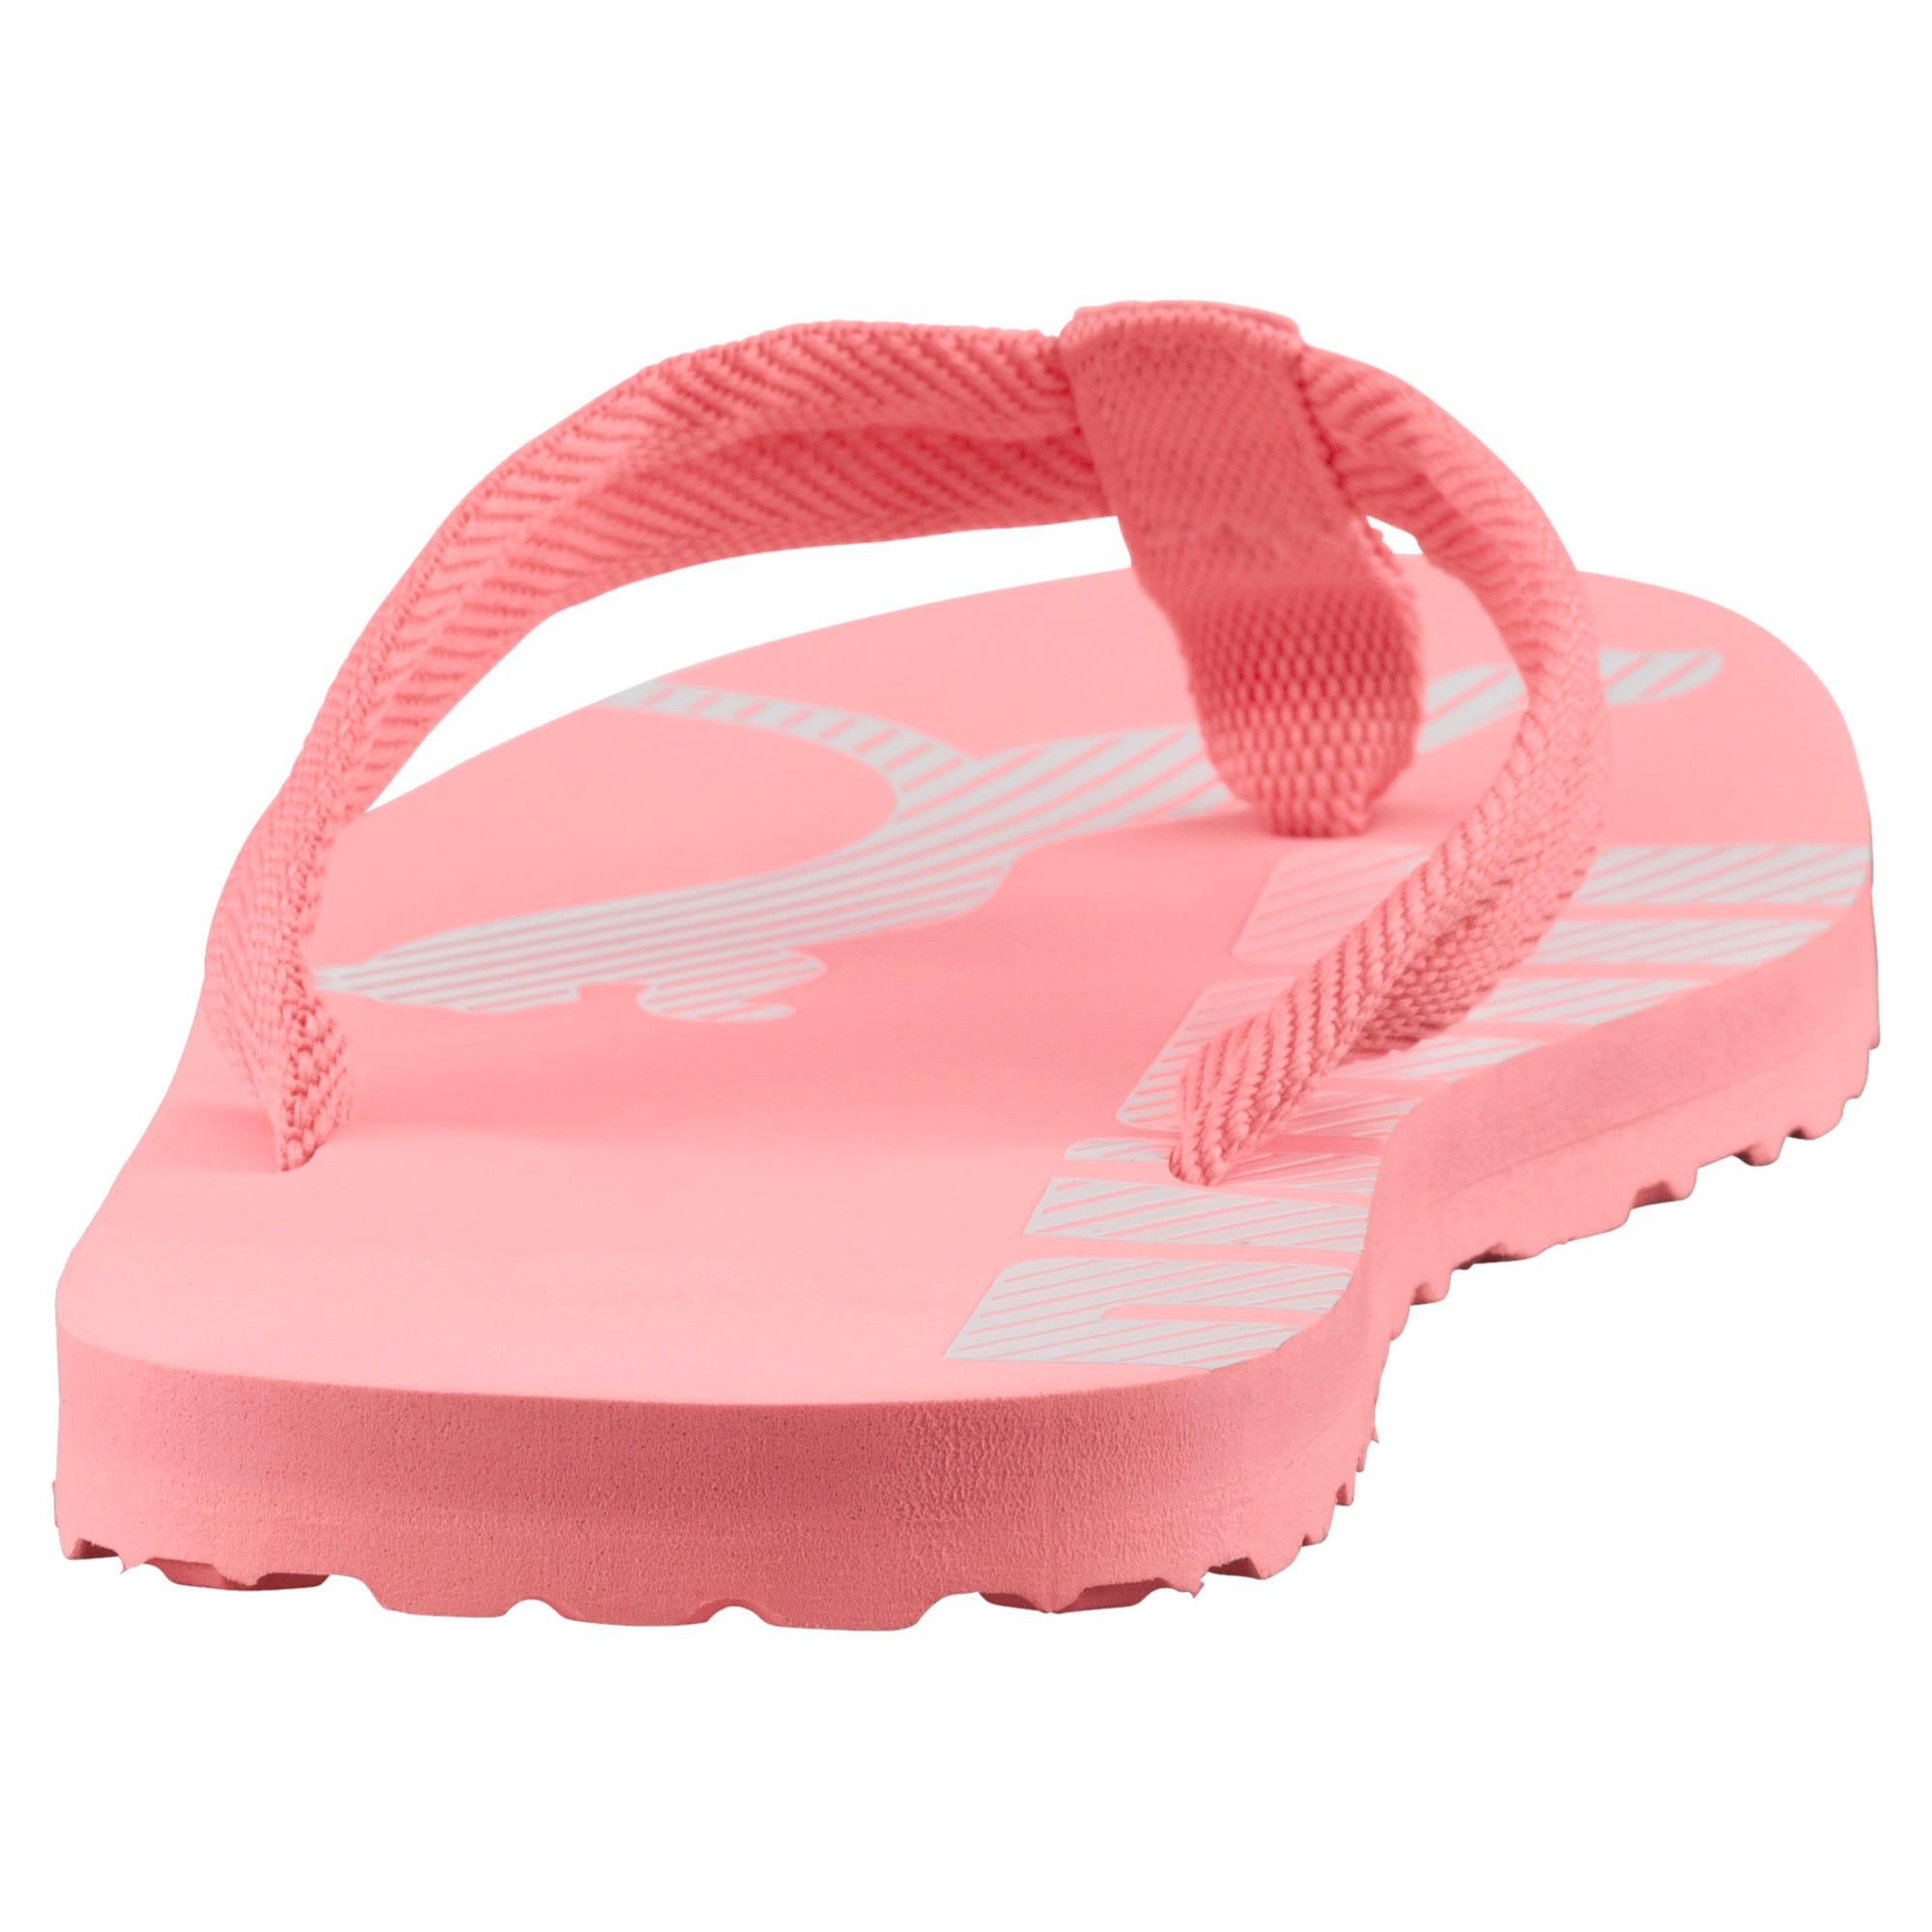 Thumbnail 4 of Epic Flip v2 Sandals, Soft Fluo Peach-Puma White, medium